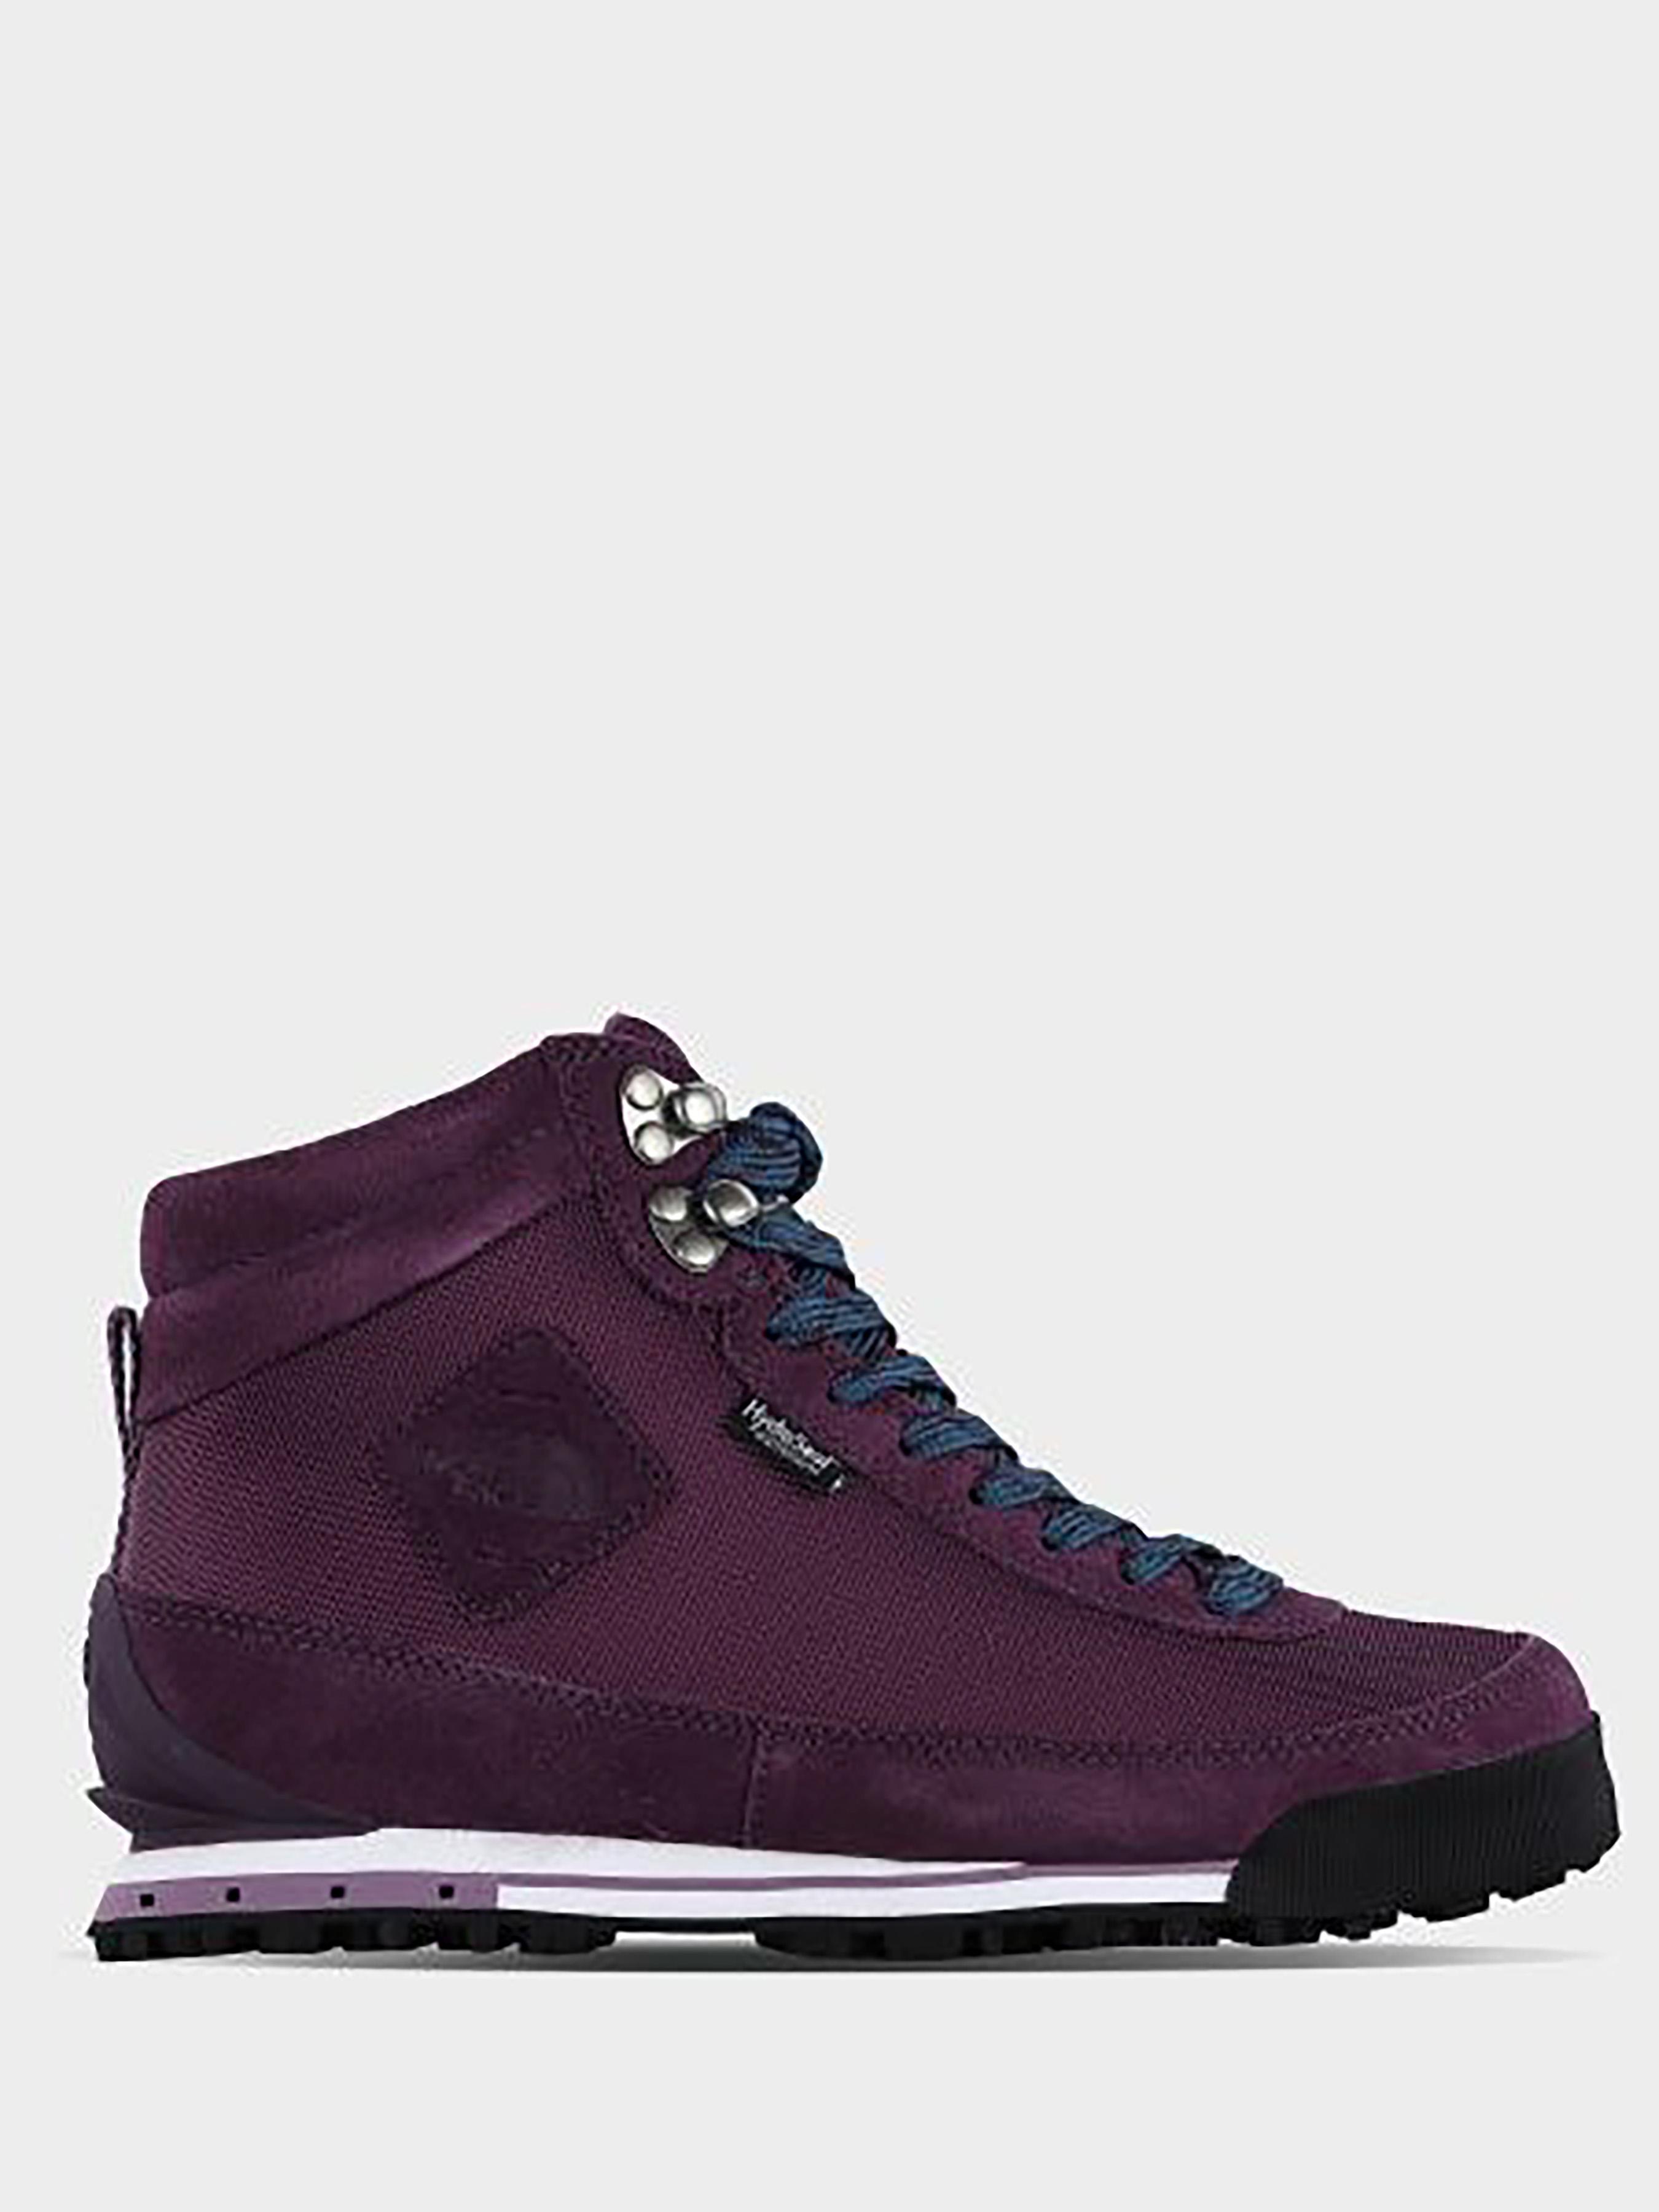 Ботинки женские The North Face Back-To-Berkeley Boot II NO9808 купить в Интертоп, 2017